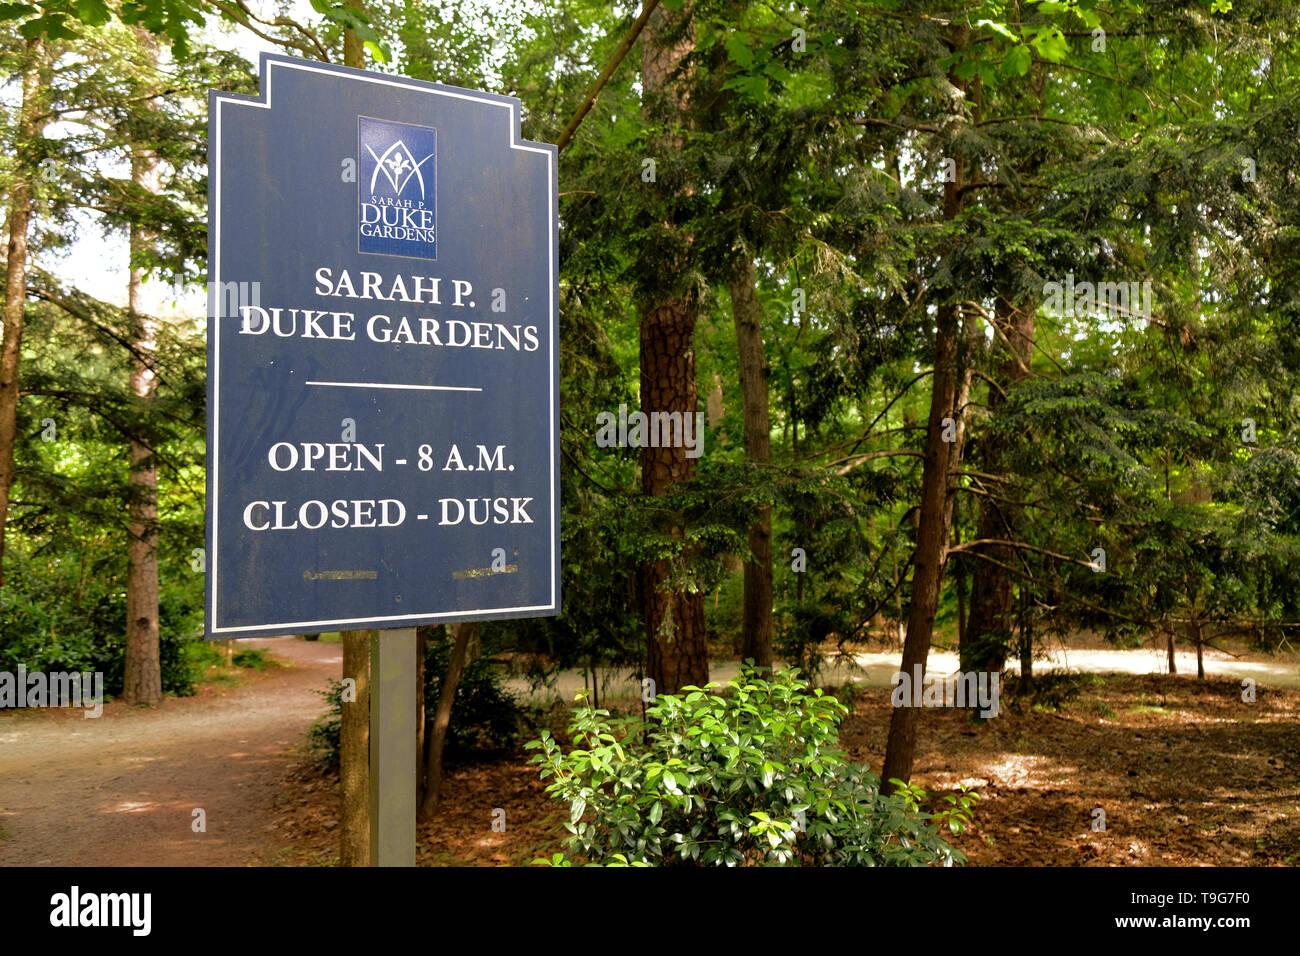 Cartello in Sarah P. Duke Gardens sul campus della Duke University in Durham, North Carolina, Stati Uniti d'America. Foto Stock